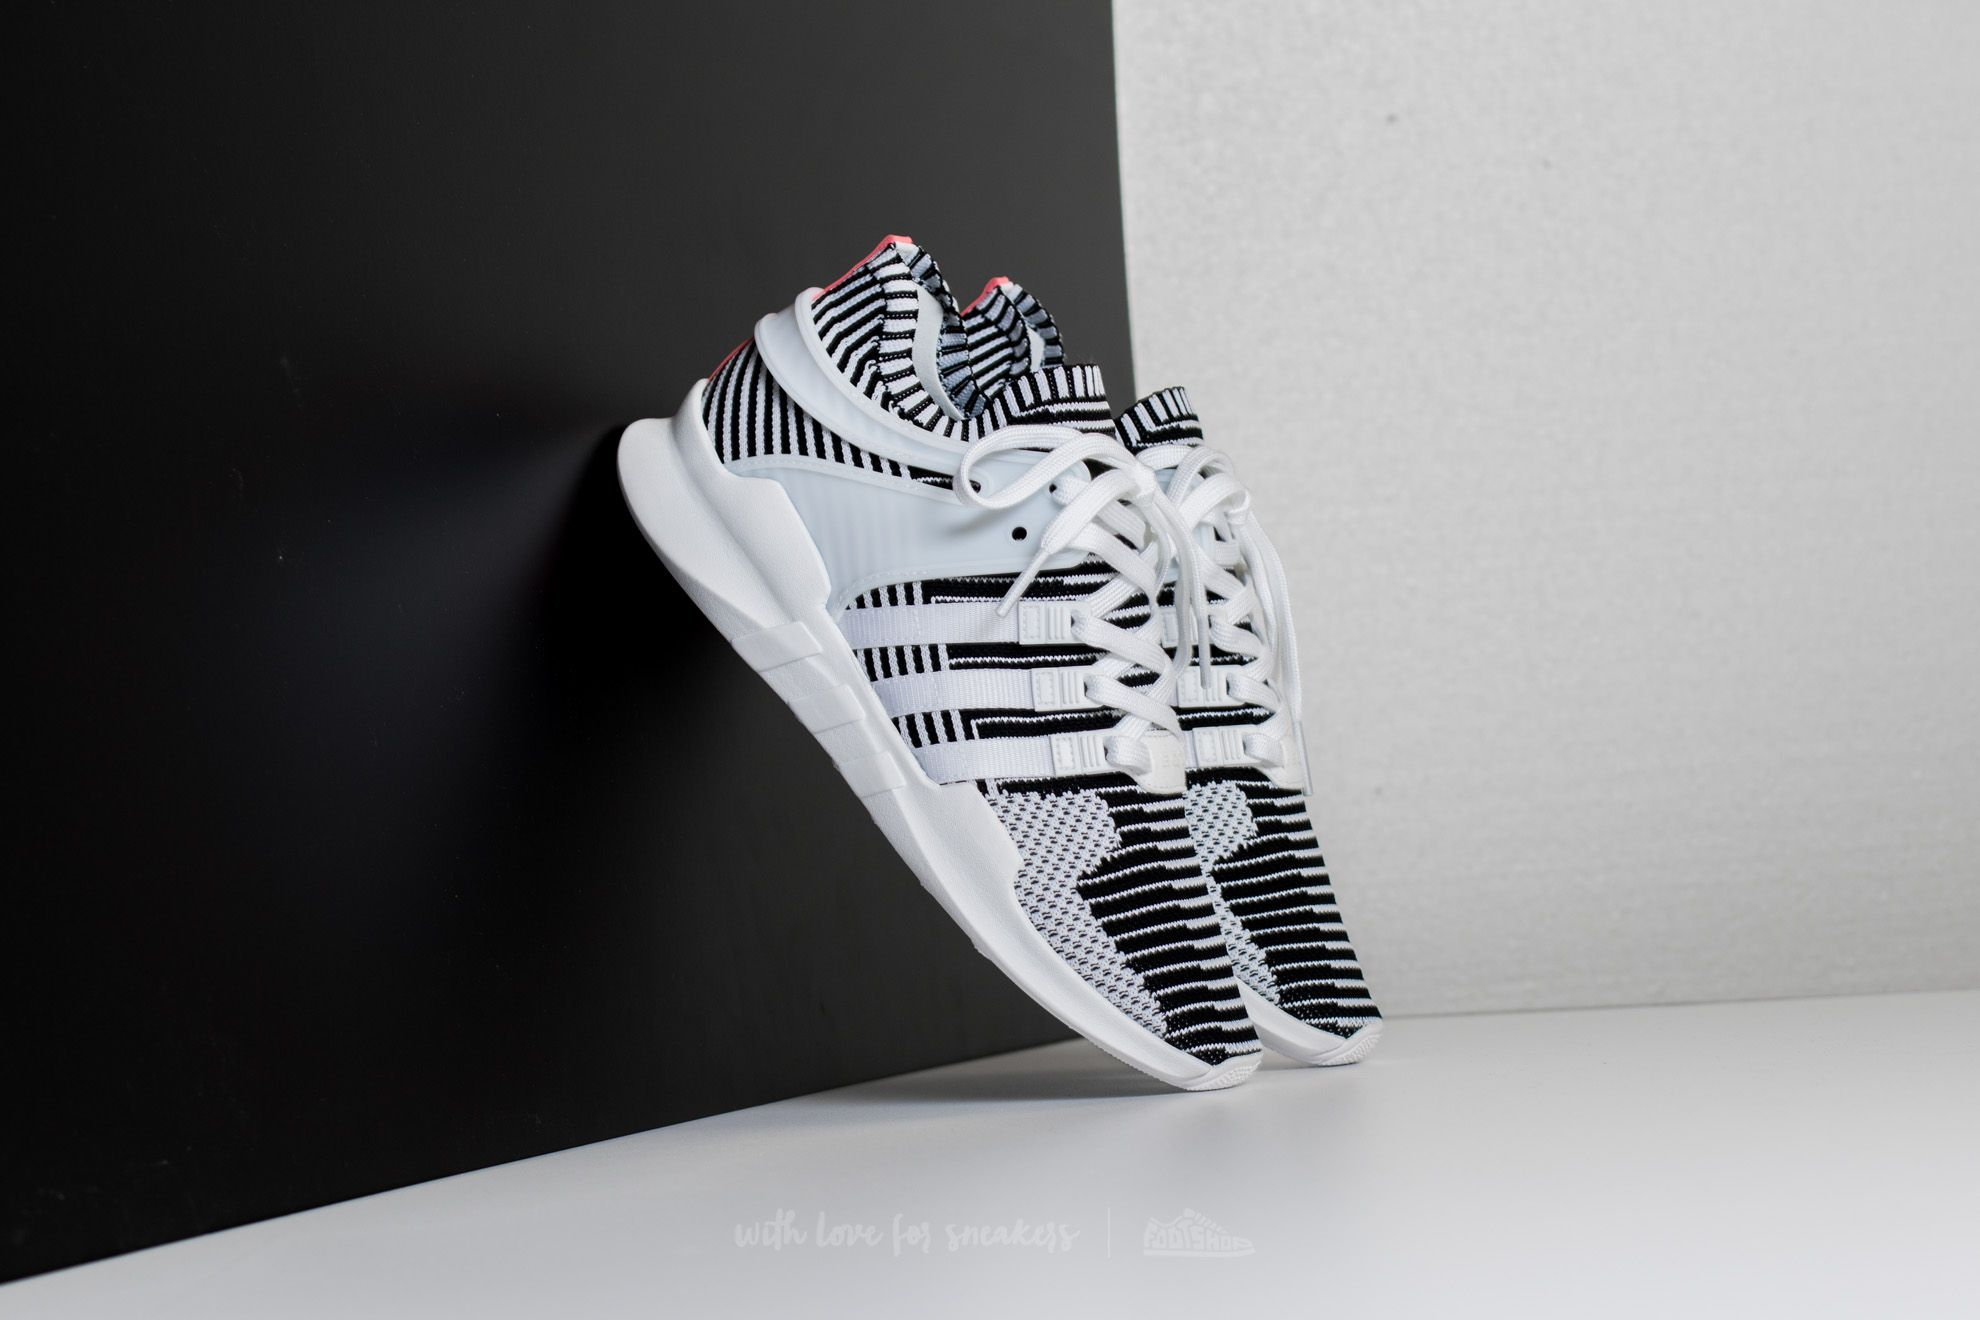 sale retailer 1af90 bee79 adidas EQT Support ADV Primeknit. Ftw White Ftw White Turbo